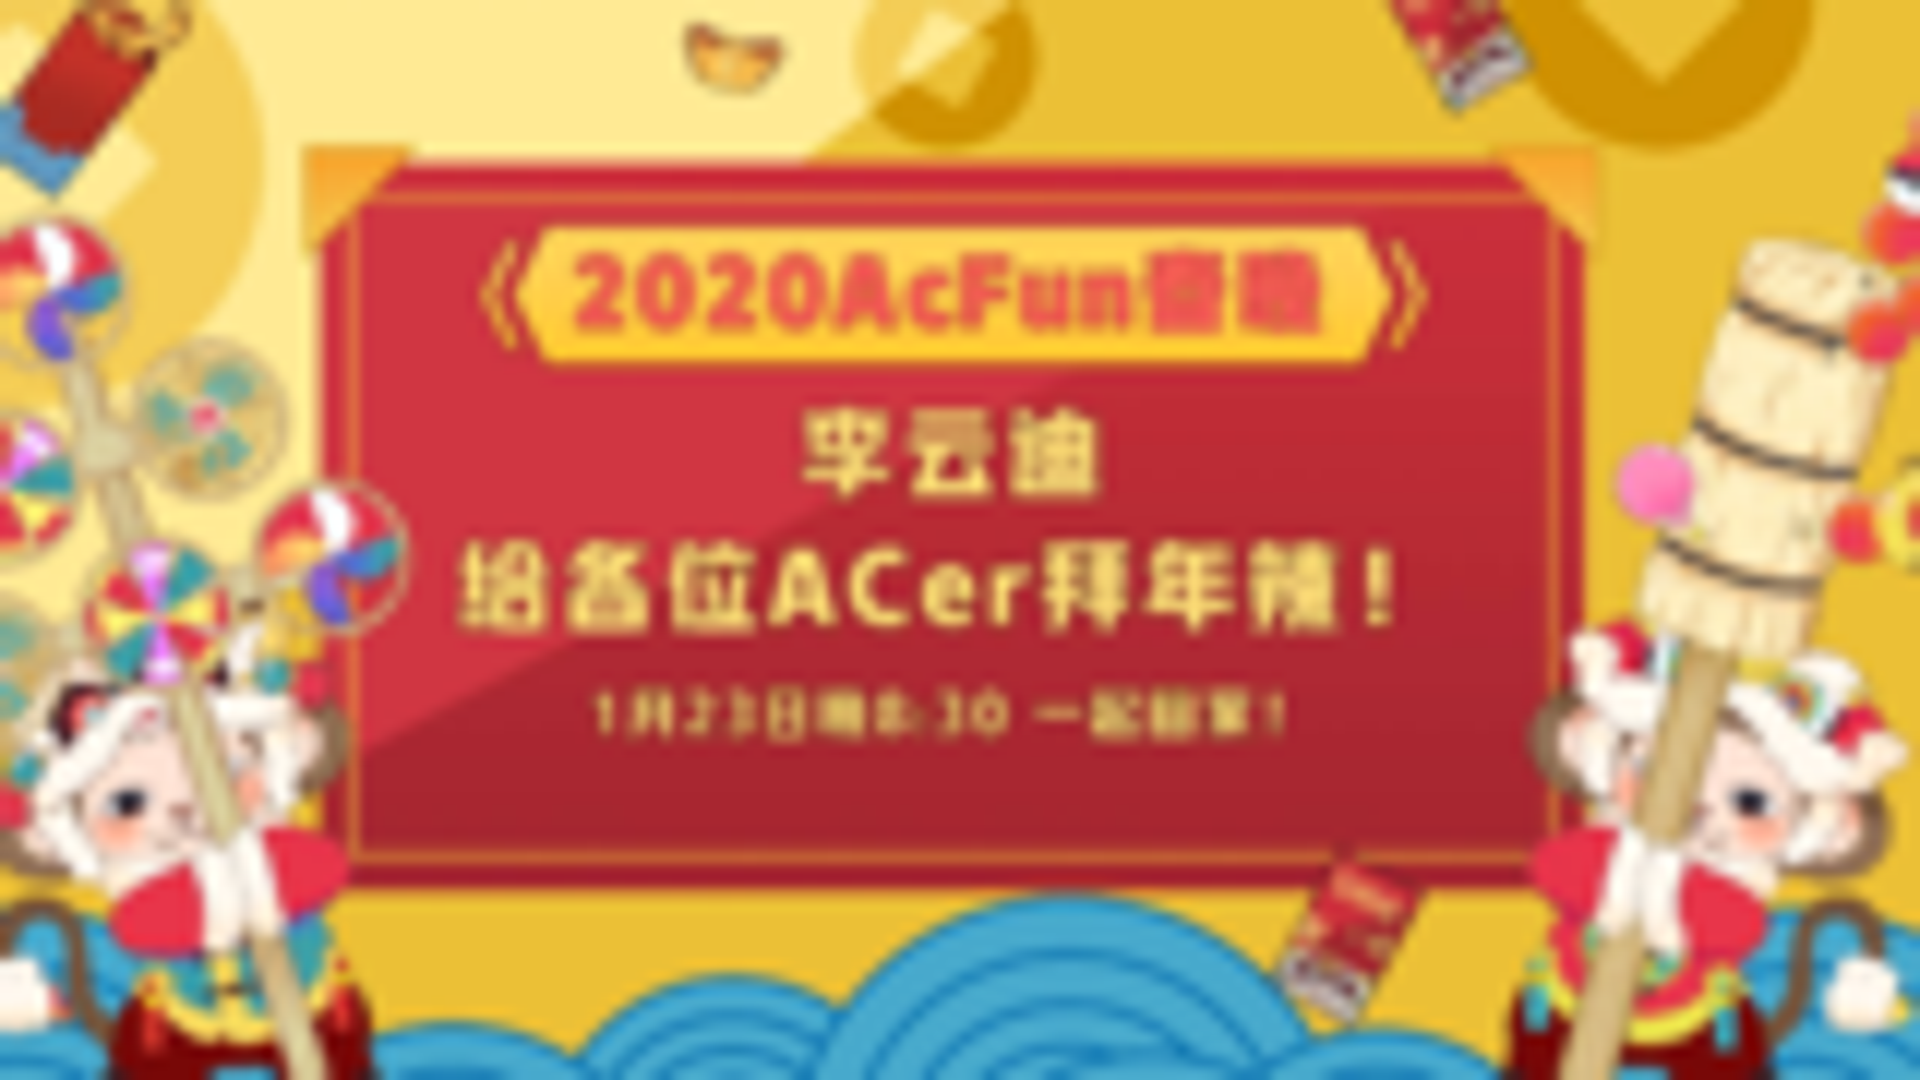 【2020A站春晚】李云迪祝各位ACer们新年快乐!